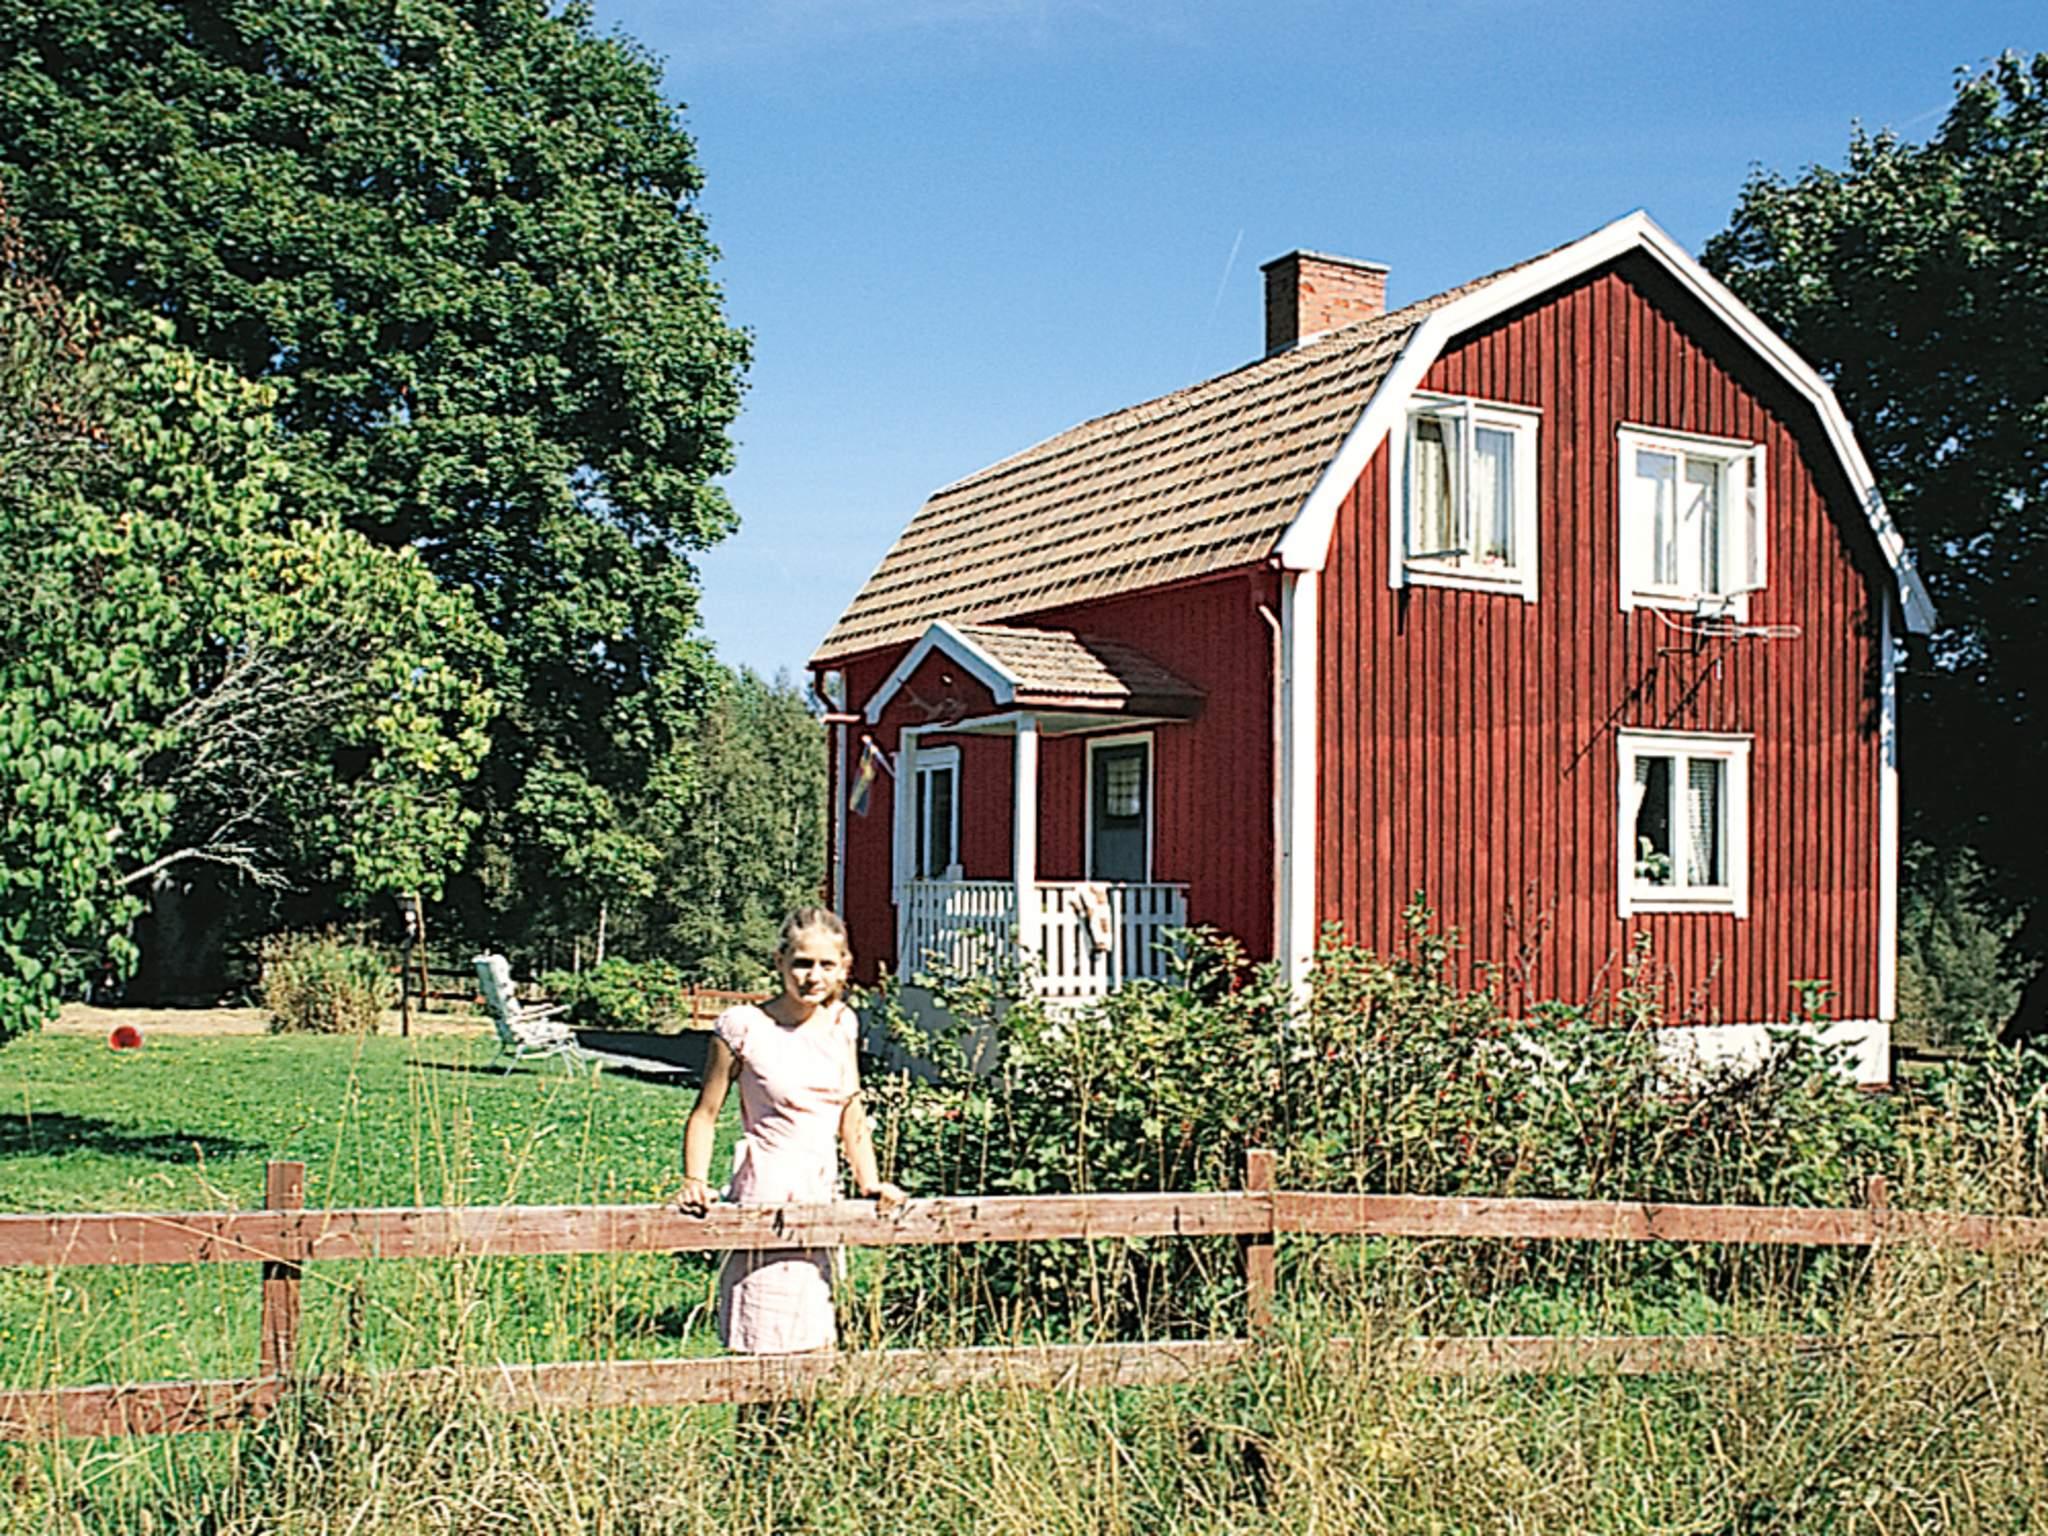 Ferienhaus Sundhultsbrunn (87123), Sunhultsbrunn, Jönköpings län, Südschweden, Schweden, Bild 10